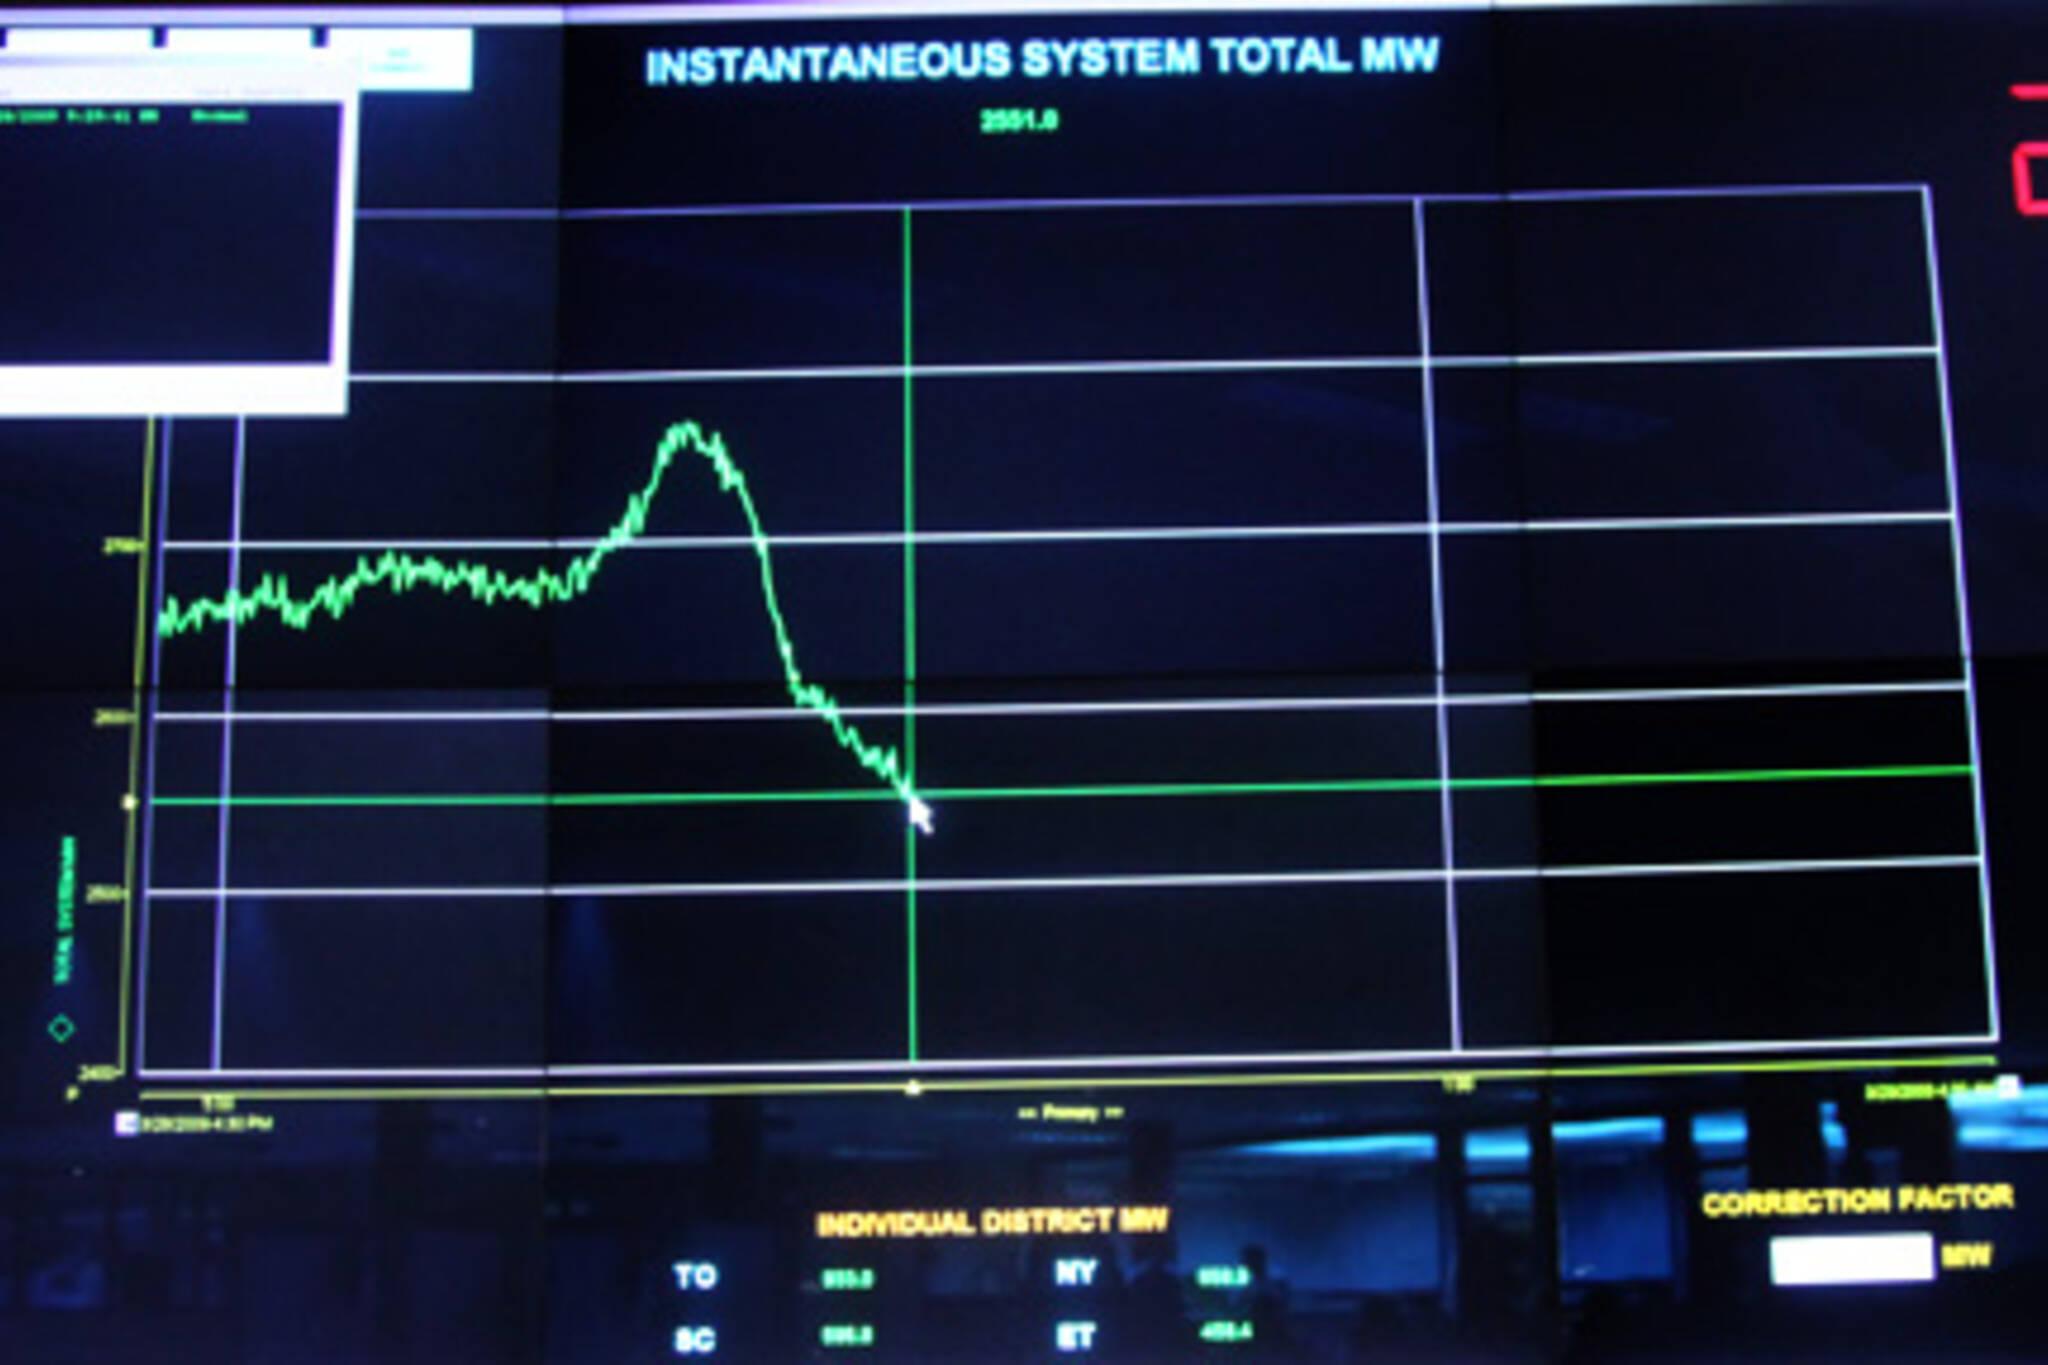 Hydro Control Room Earth Hour